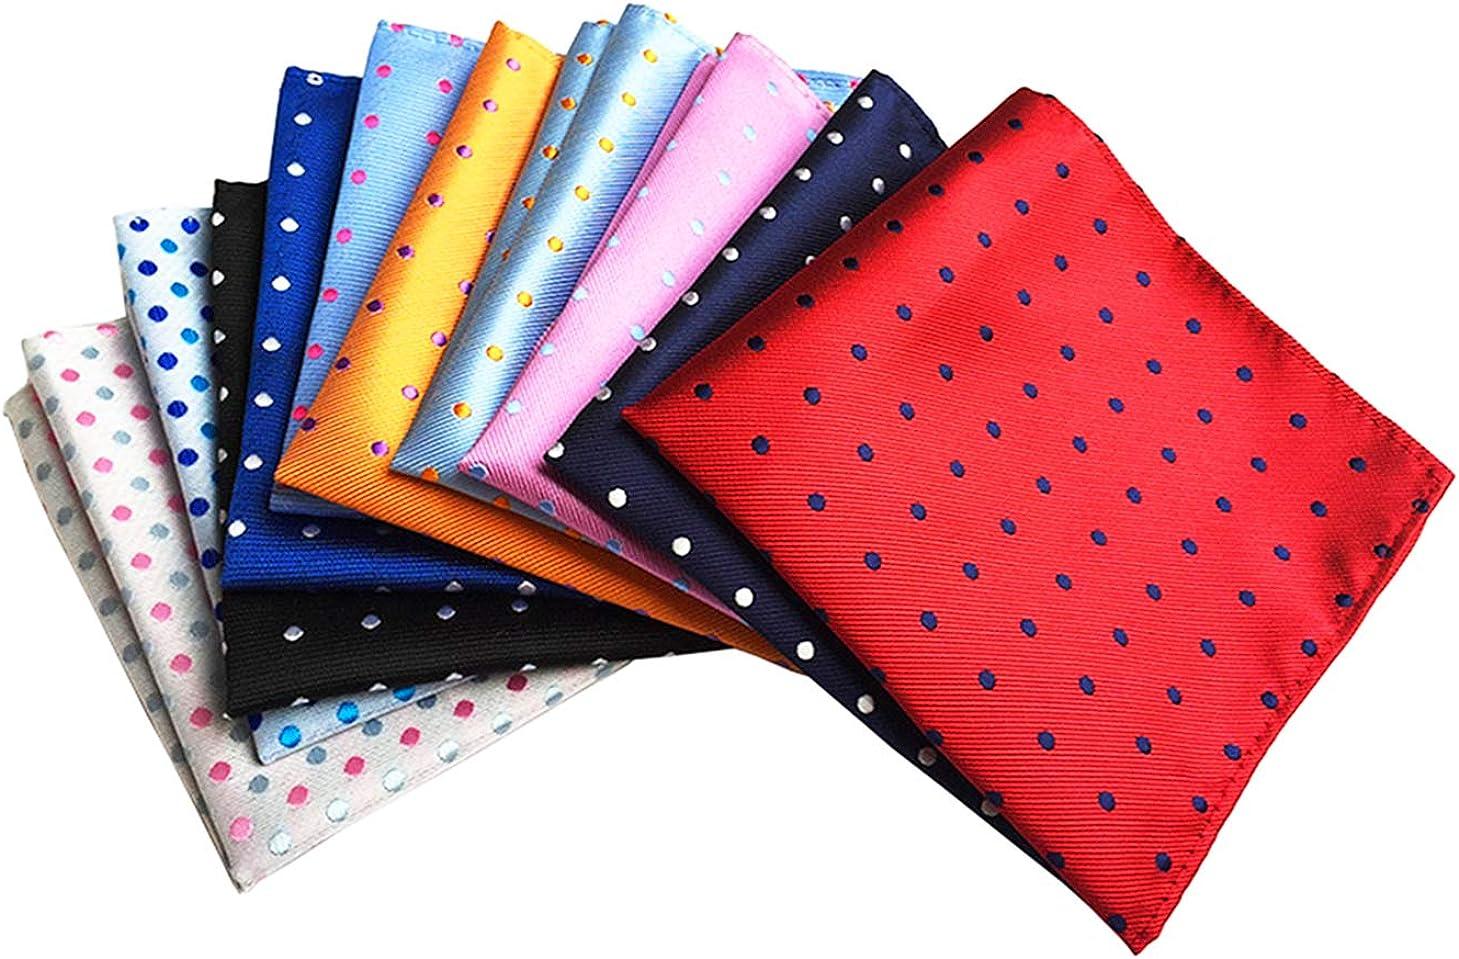 Lot 10 Packs Men/'s High Quality Pocket Handkerchief Premium Square Paisley Hanky